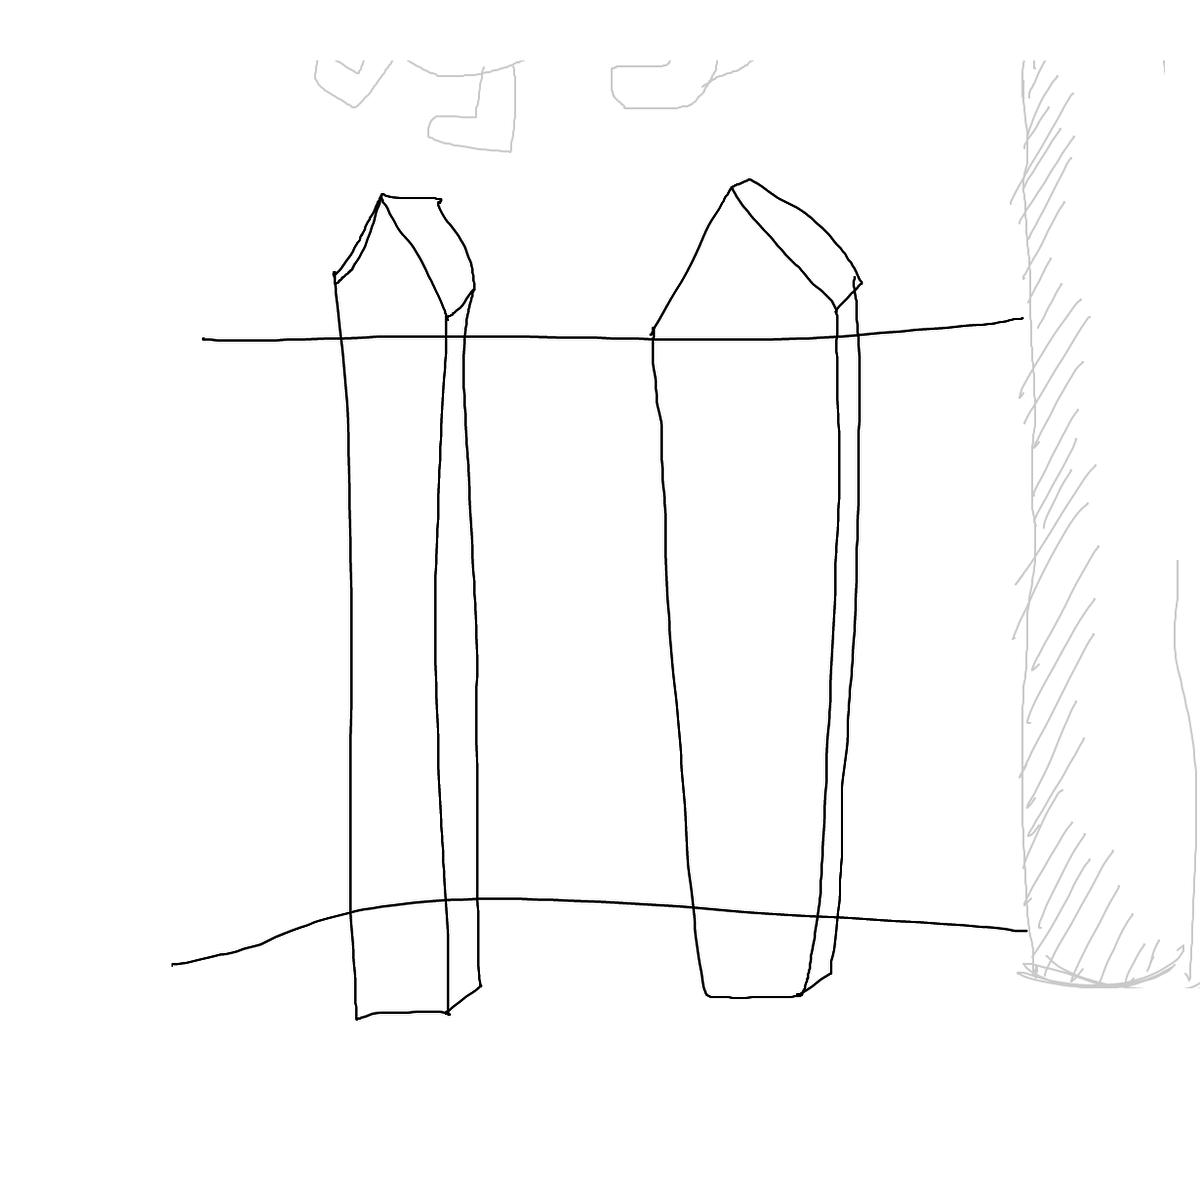 BAAAM drawing#16128 lat:52.4752502441406250lng: 13.4059572219848630